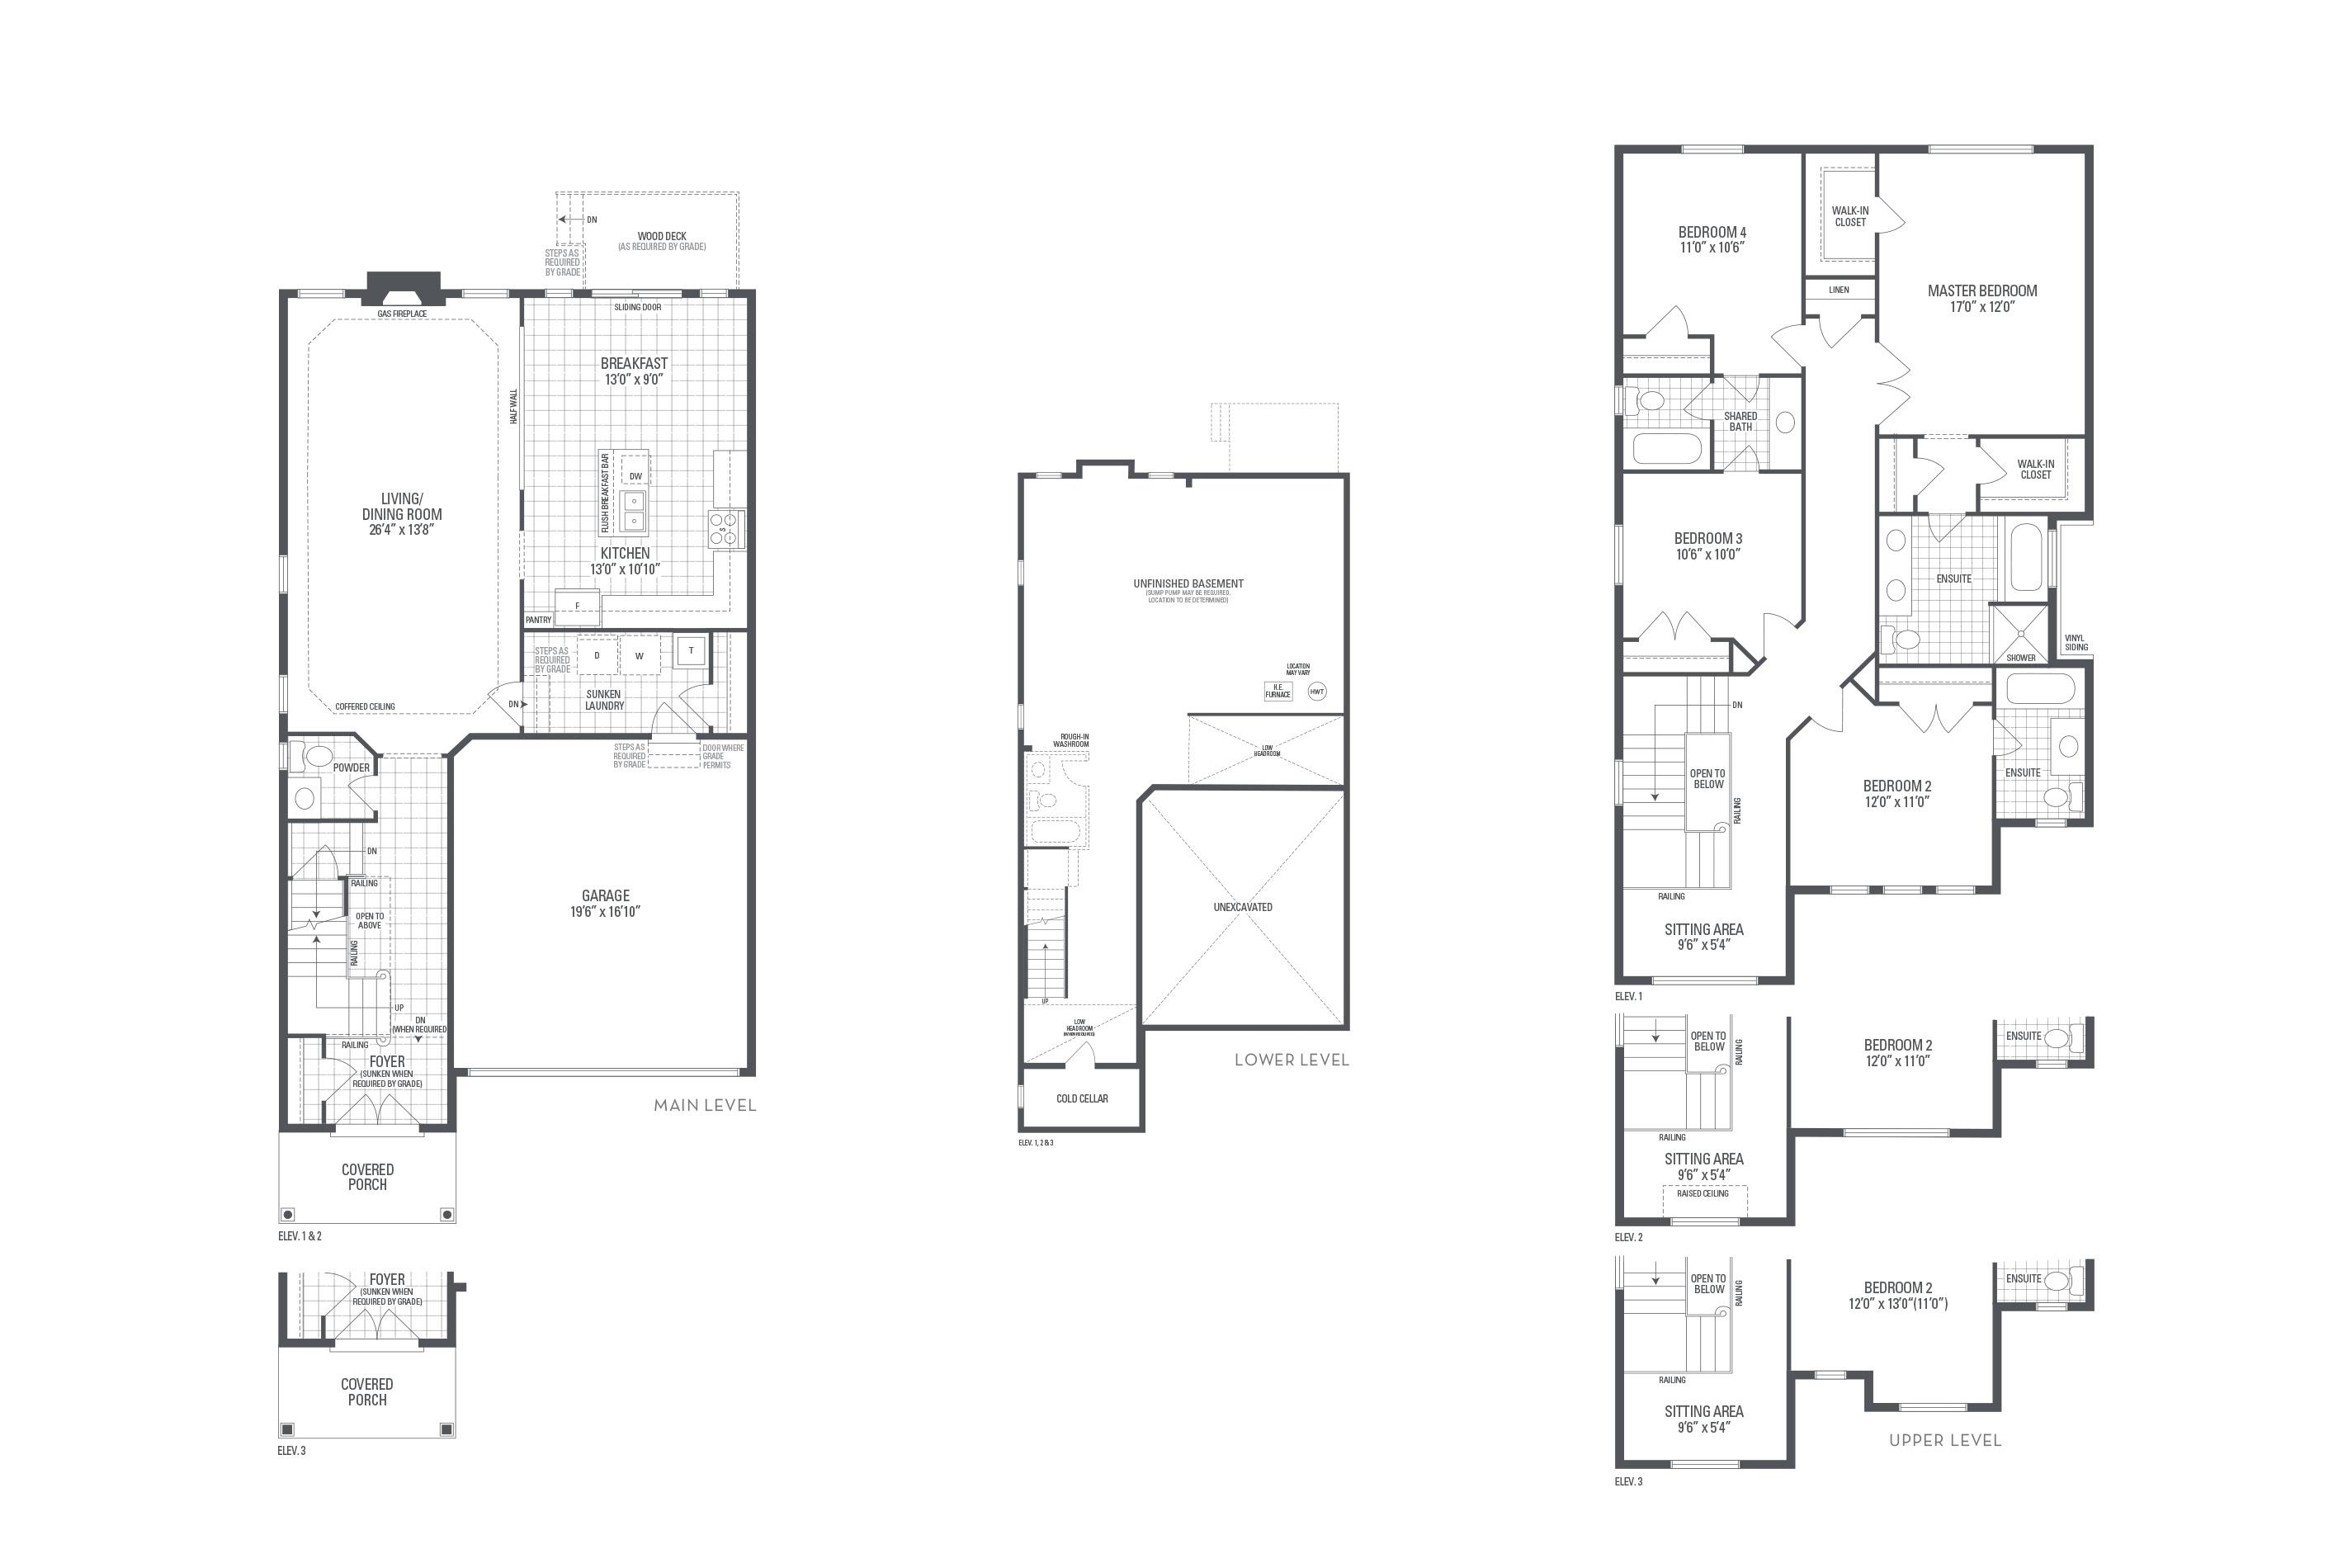 Bronte 04 Elev. 2 Floorplan